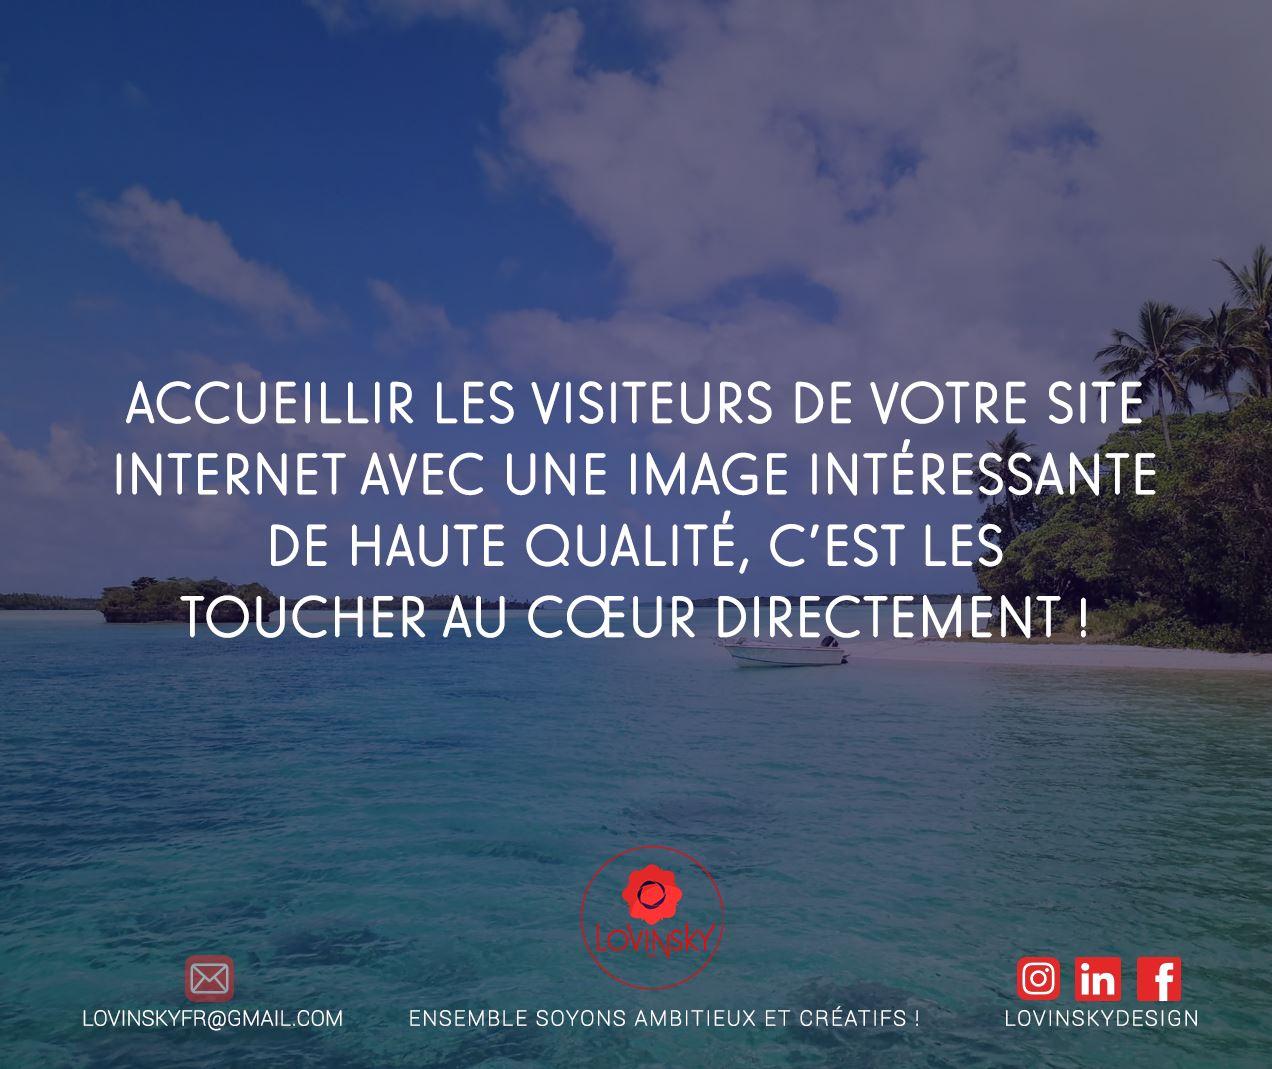 image-haute-qualité-lovinsky-graphiste-webdesigner-nantes-freelance-44 v1